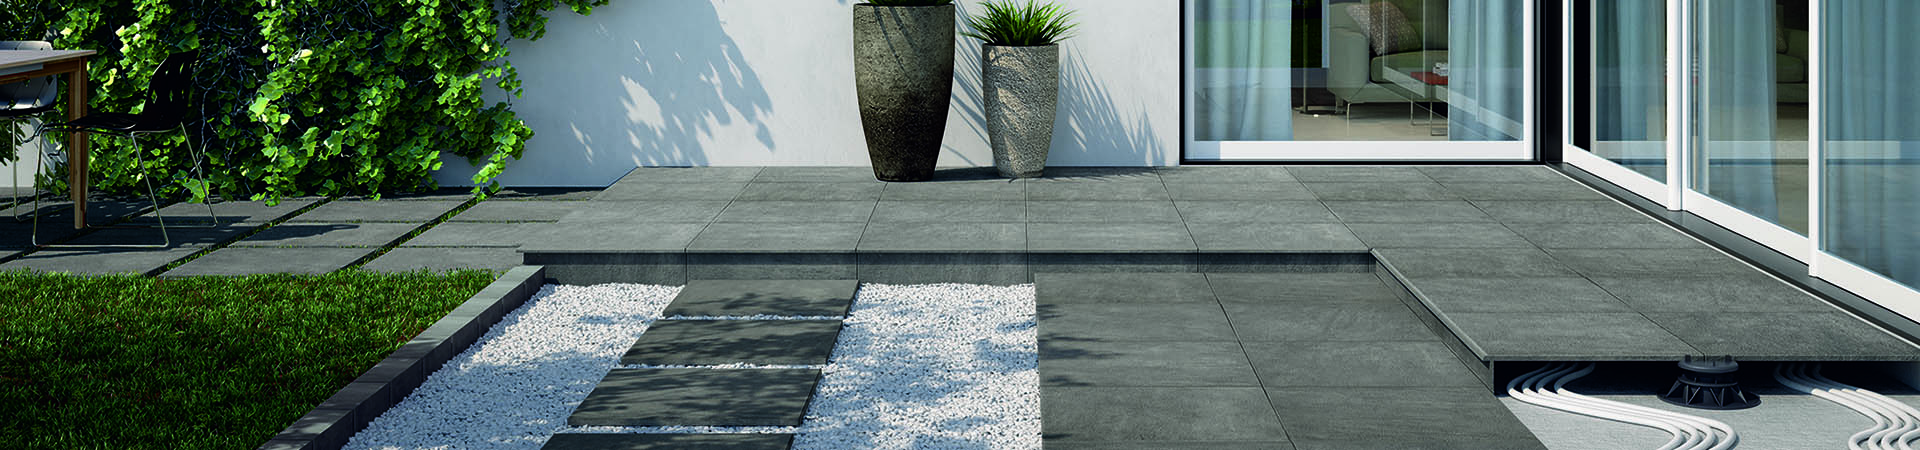 Lemmens Tegels   Keramische tegels - tuin & terras